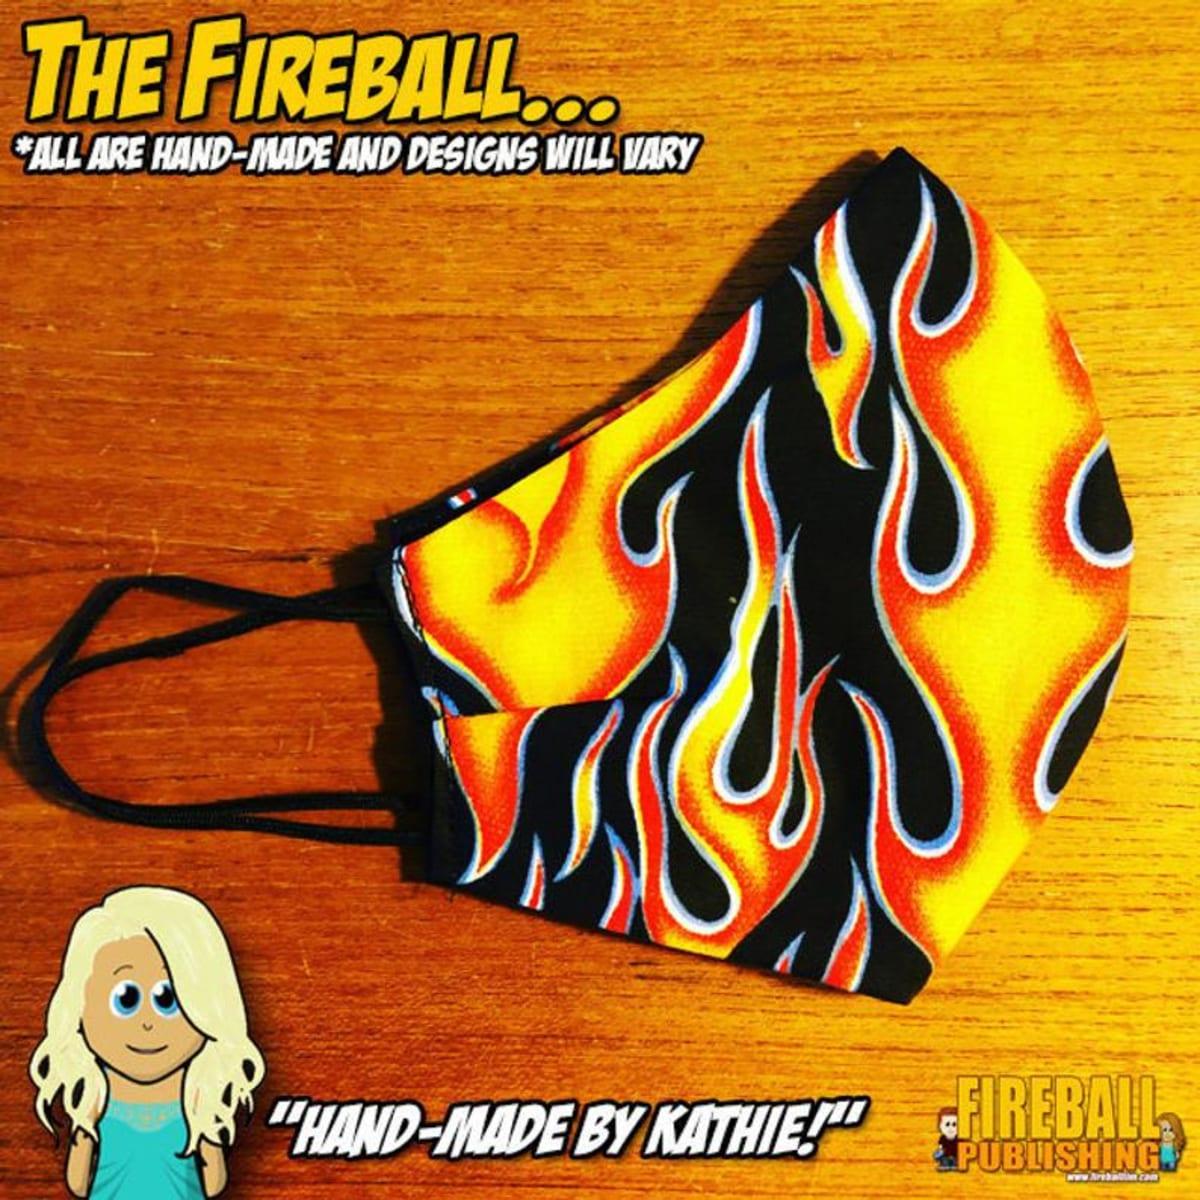 The Fireball Facemask